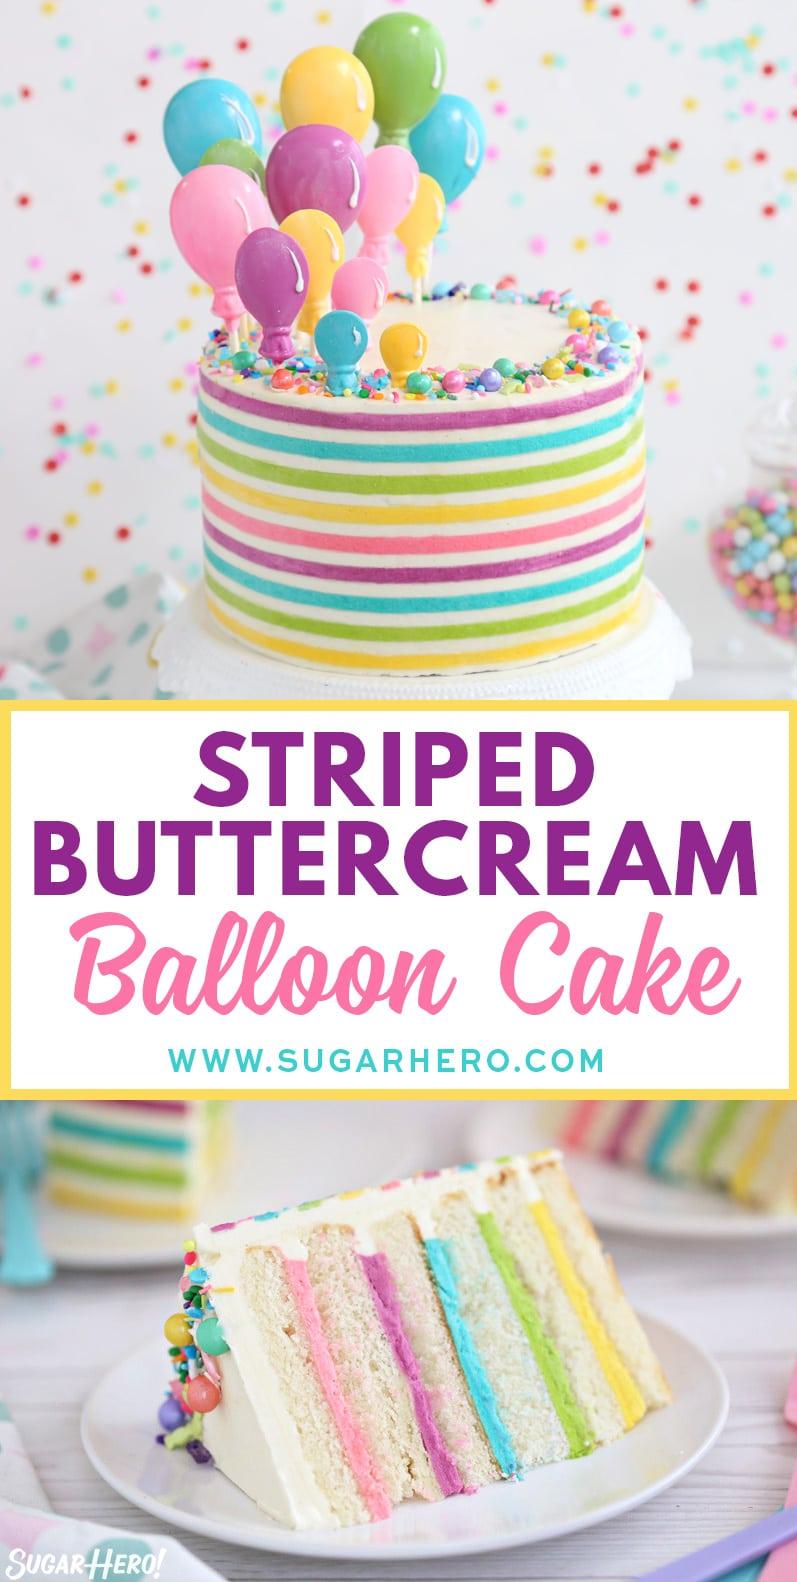 Striped Buttercream Balloon Cake   From SugarHero.com